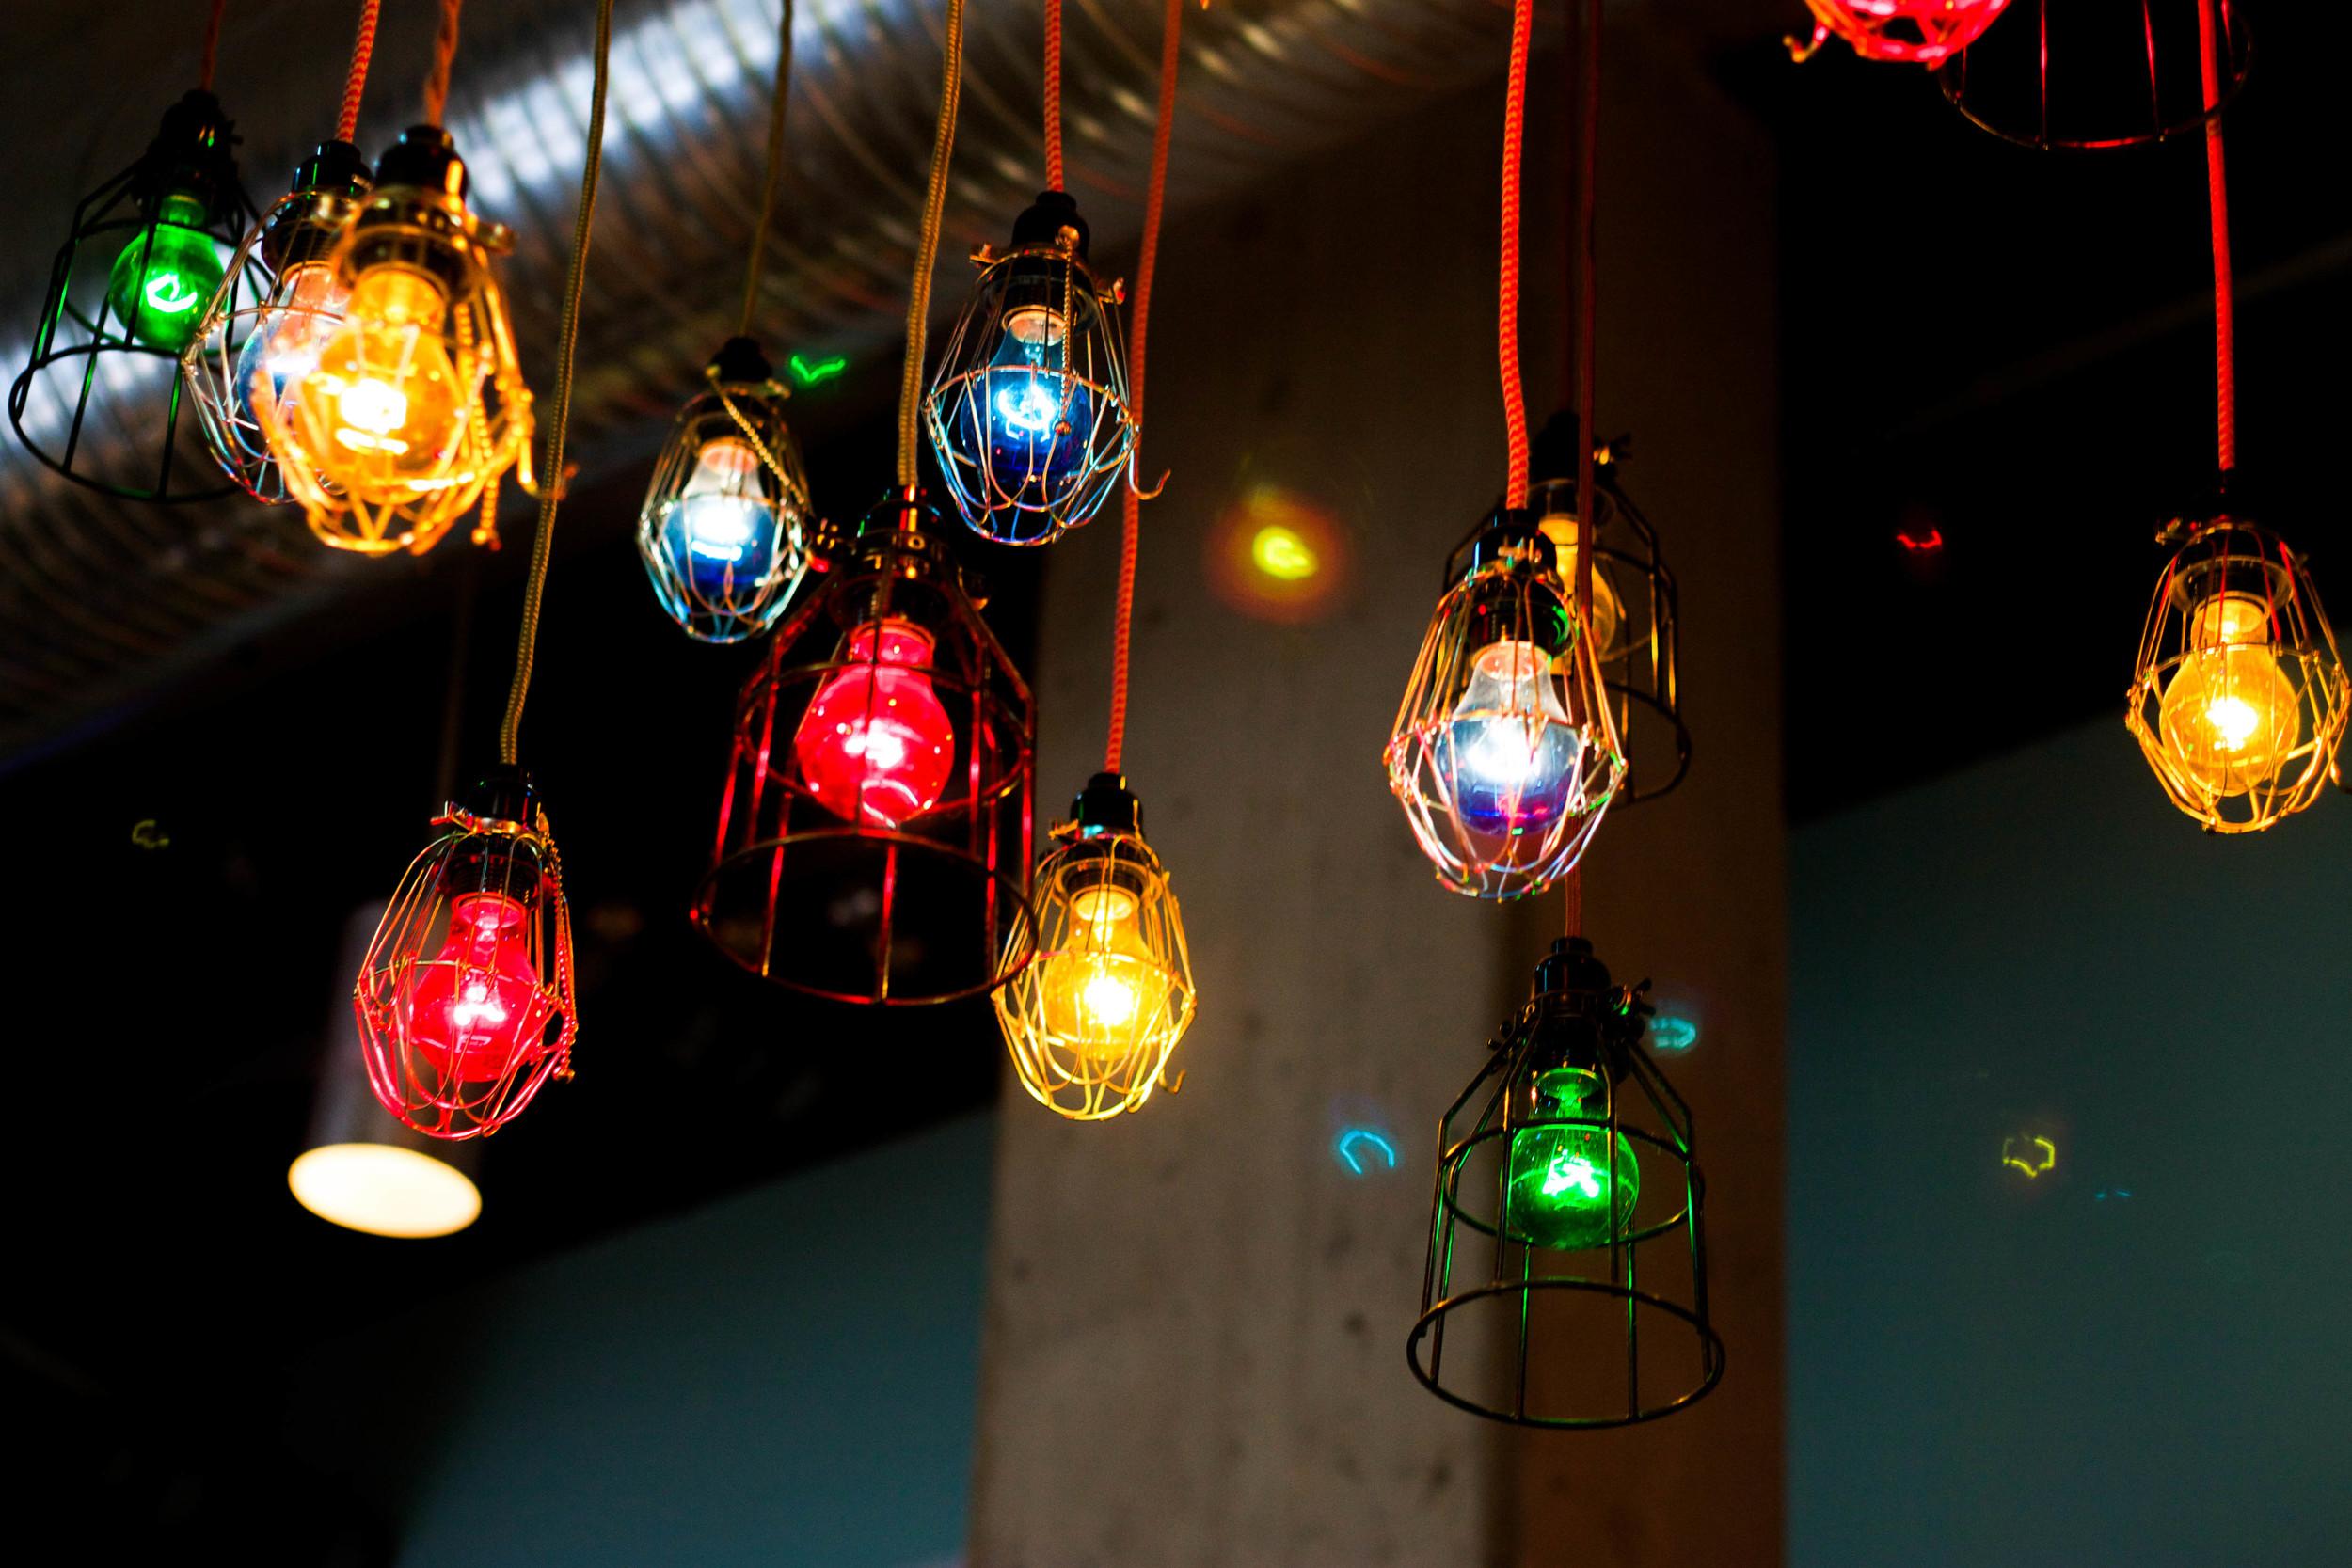 Low Hanging Lights at Port Fonda